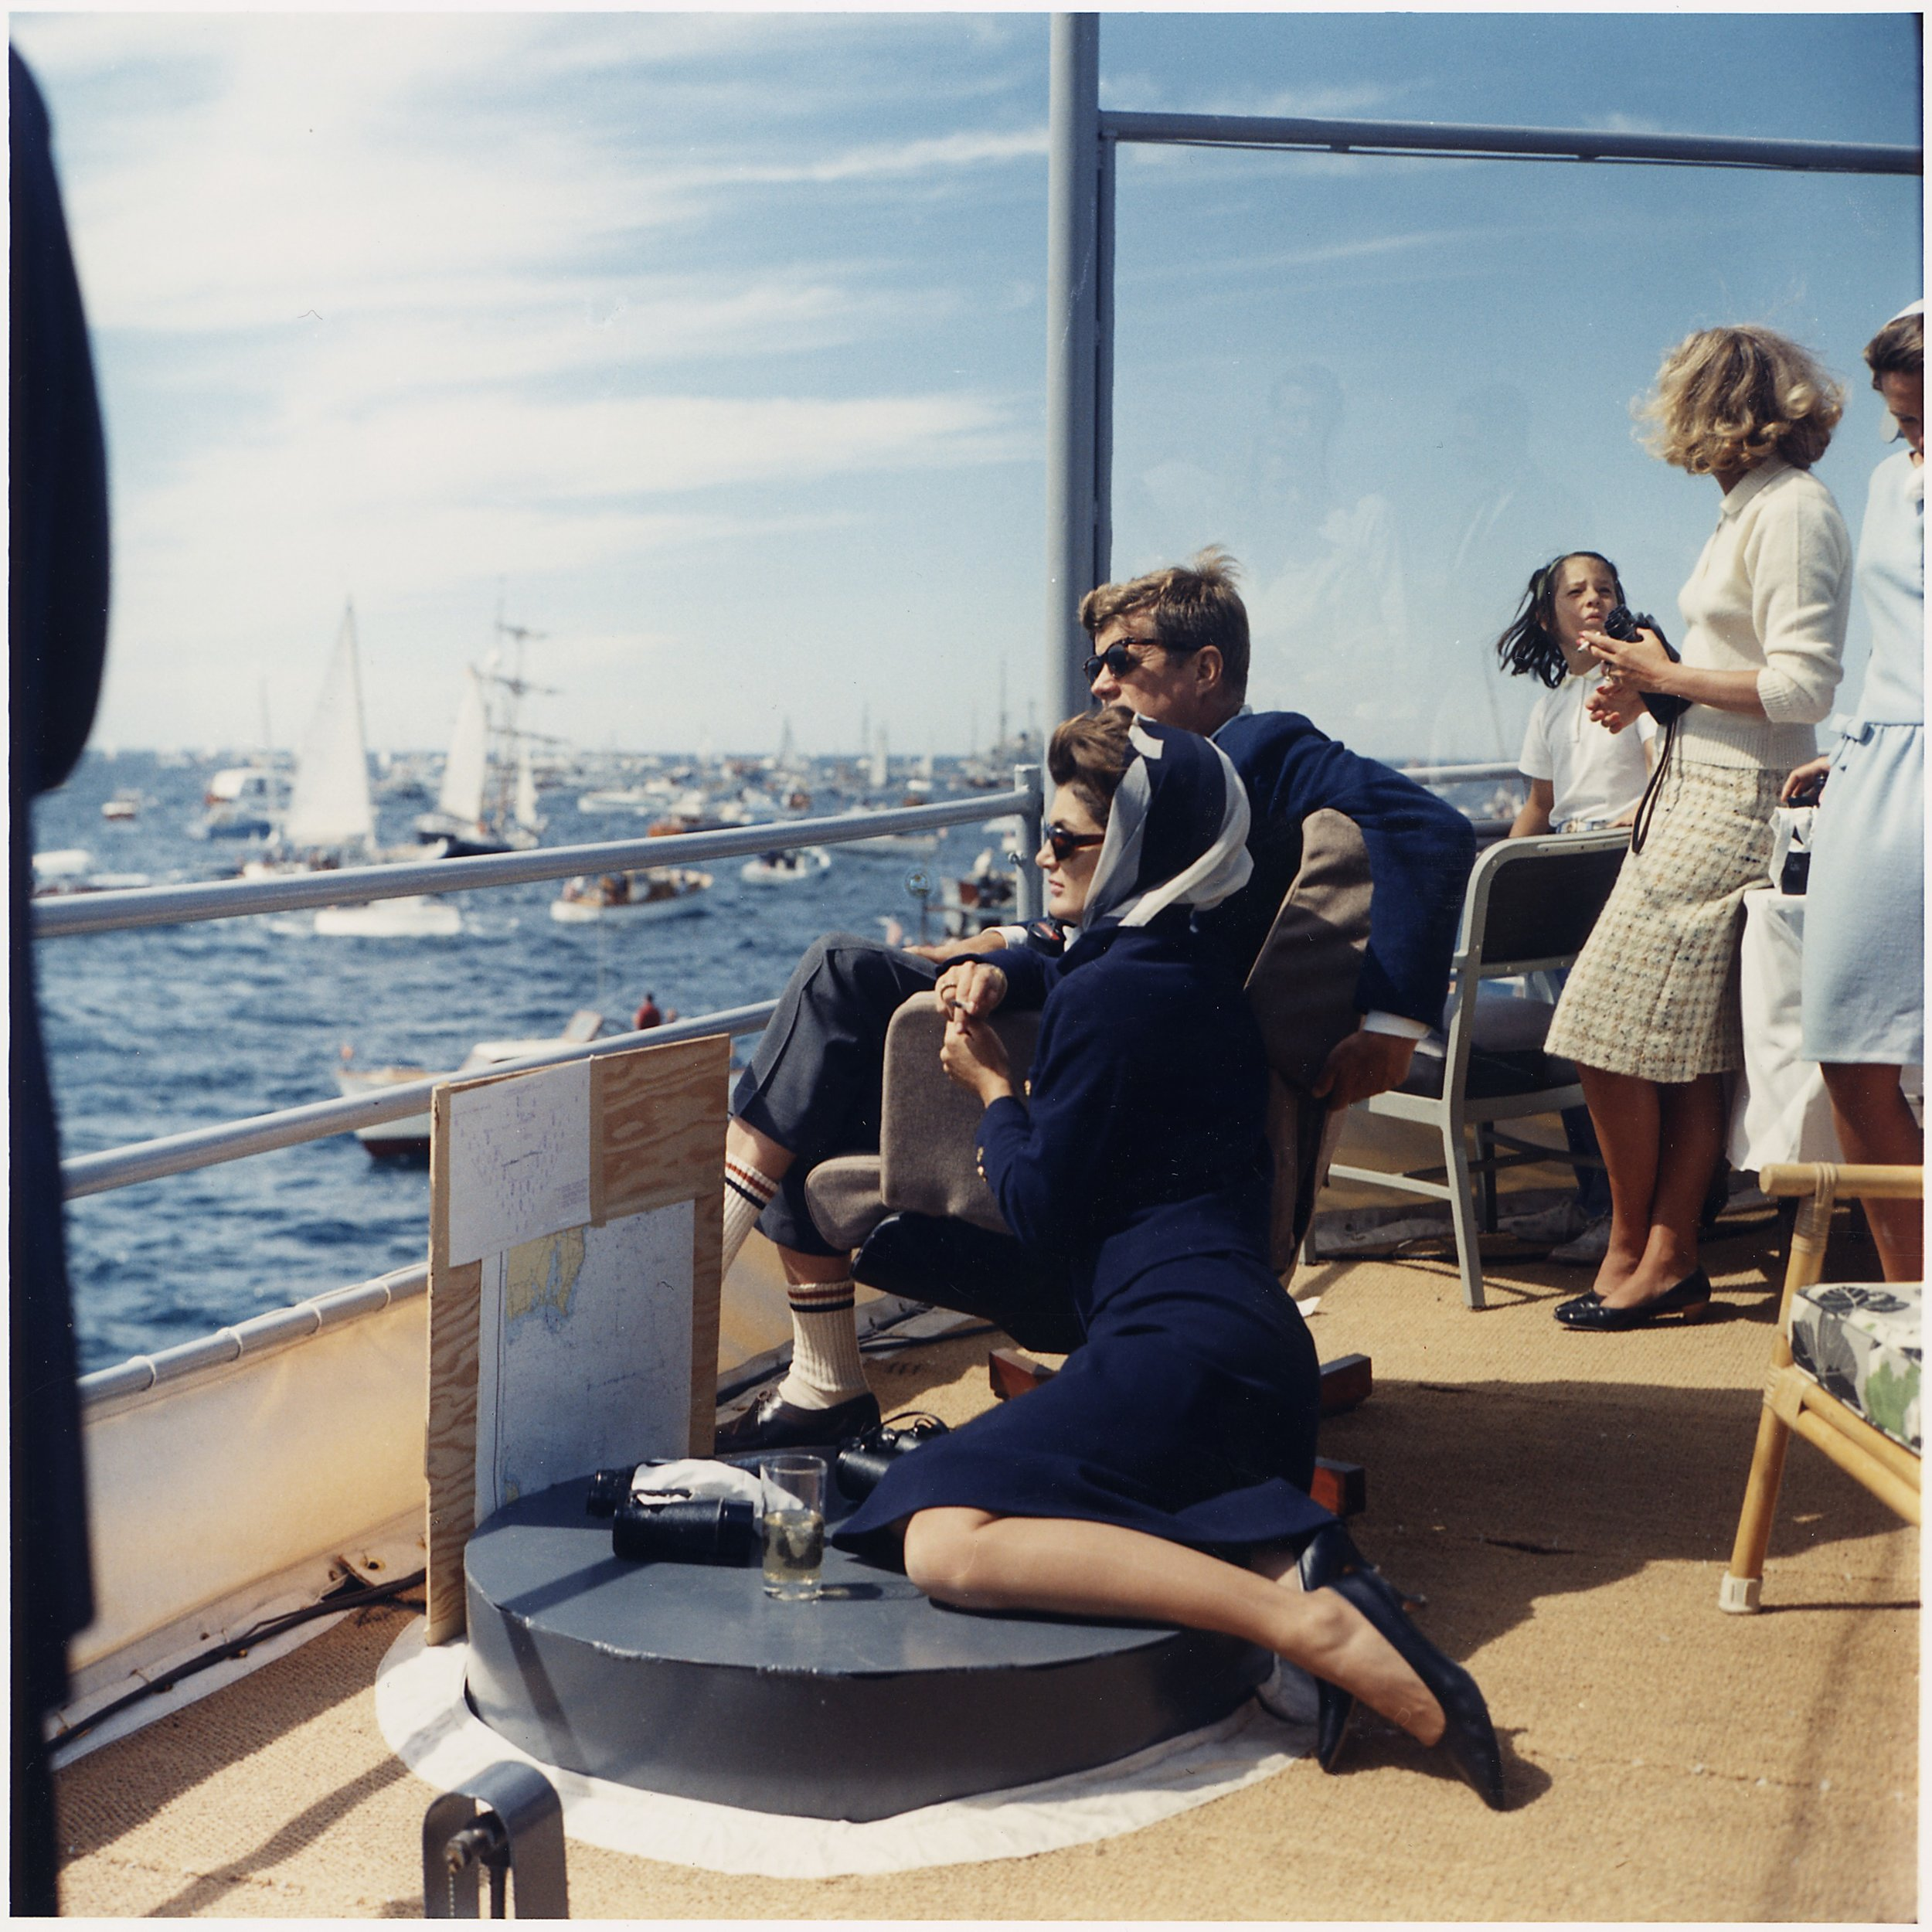 Watching_the_America's_Cup_Race._Mrs._Kennedy,_President_Kennedy,_others._Off_Newport,_RI,_aboard_the_USS_Joseph_P...._-_NARA_-_194214.jpg